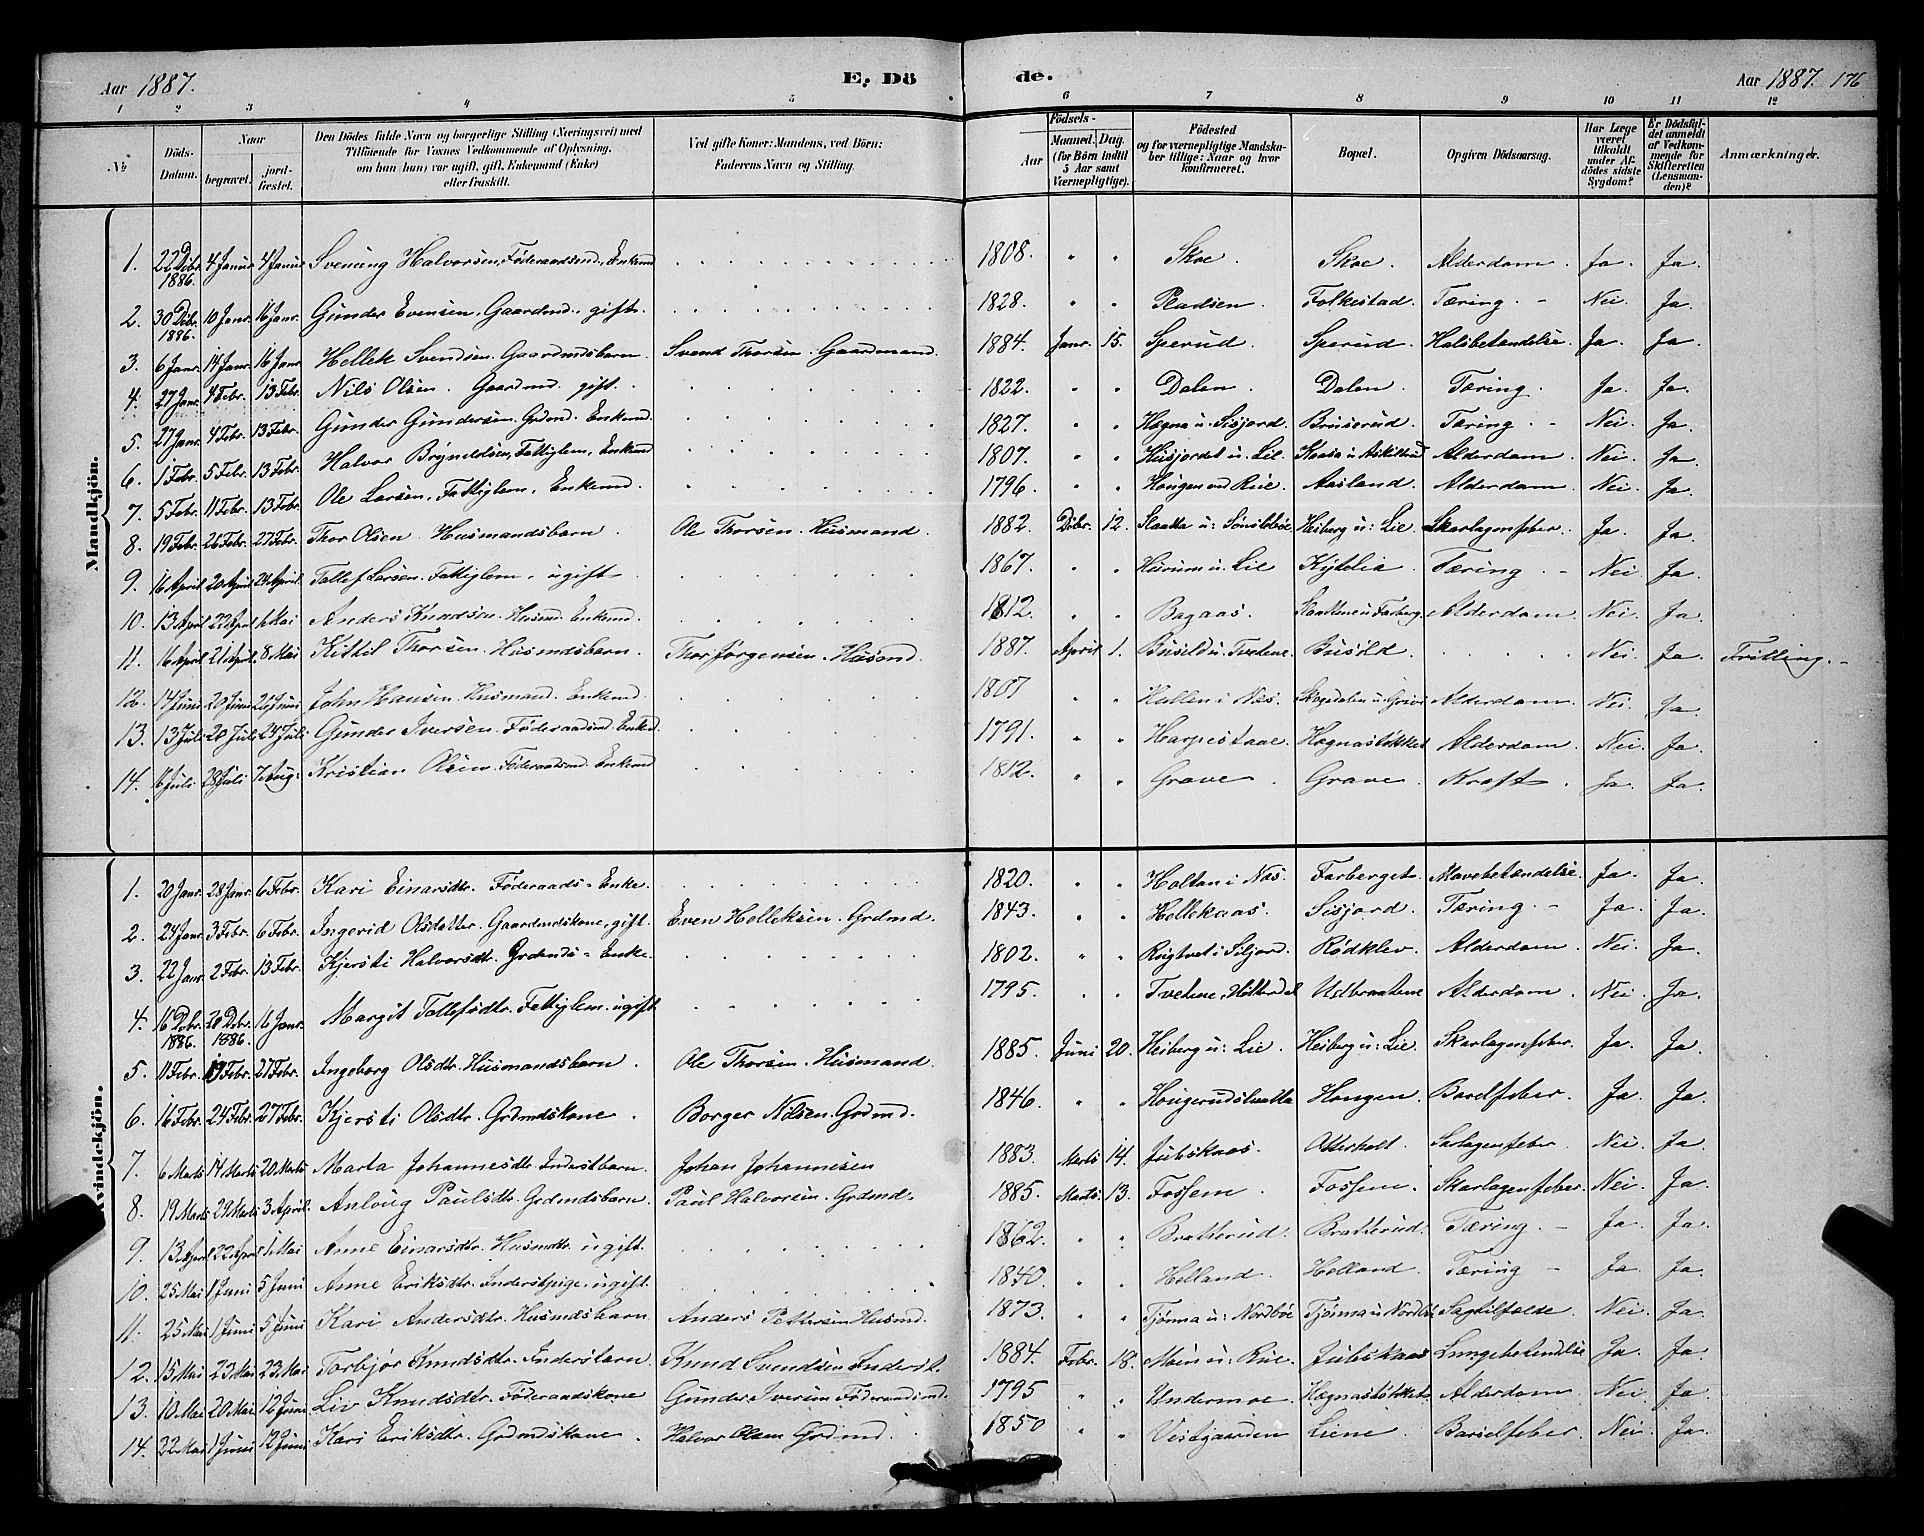 SAKO, Bø kirkebøker, G/Ga/L0005: Klokkerbok nr. 5, 1883-1897, s. 176